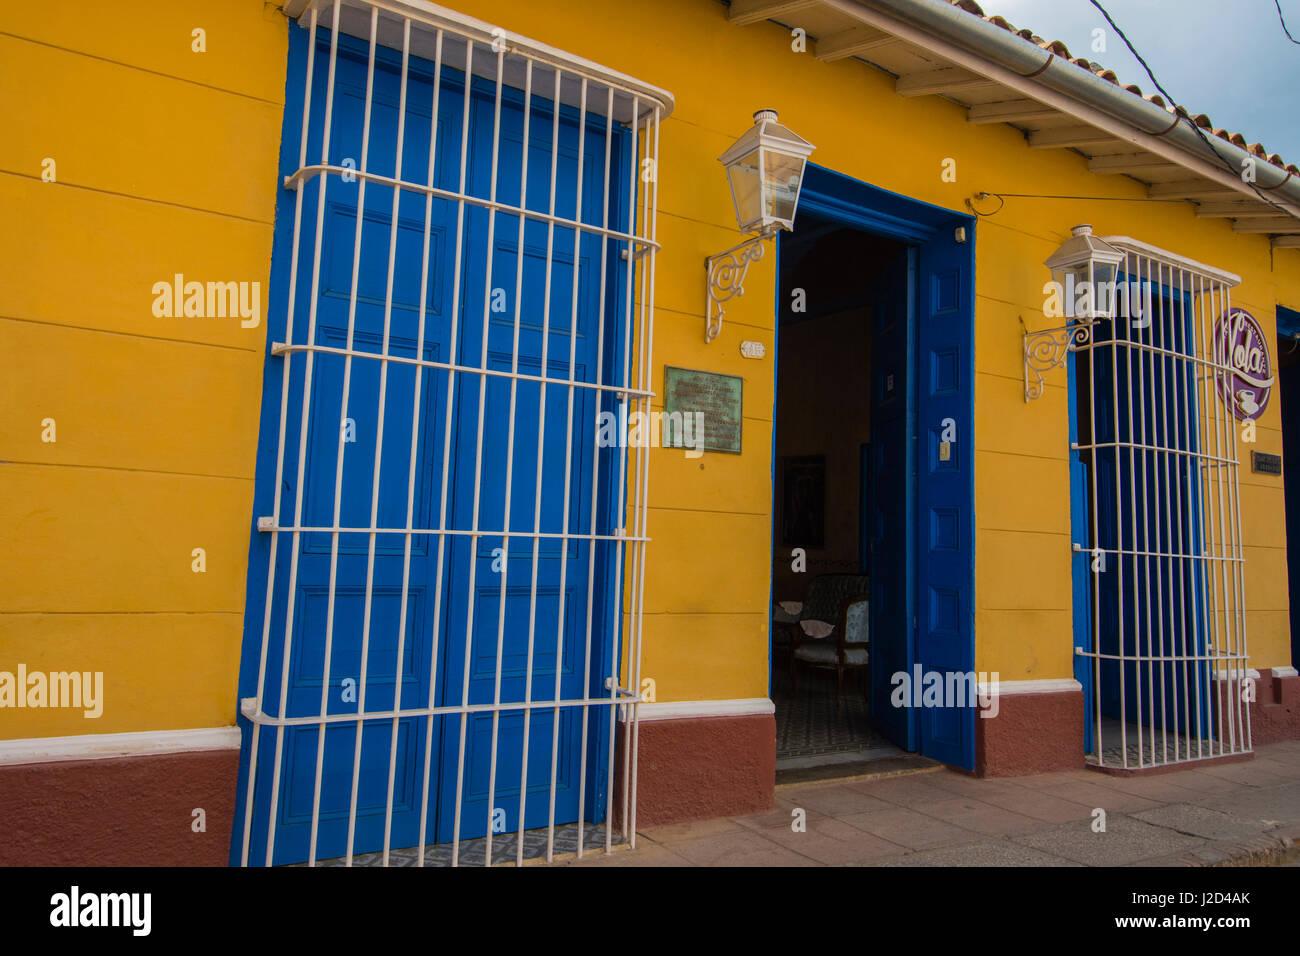 Cuba, Sancti Spiritus Province, Trinidad. Brightly painted houses line the streets of colonial Trinidad. - Stock-Bilder